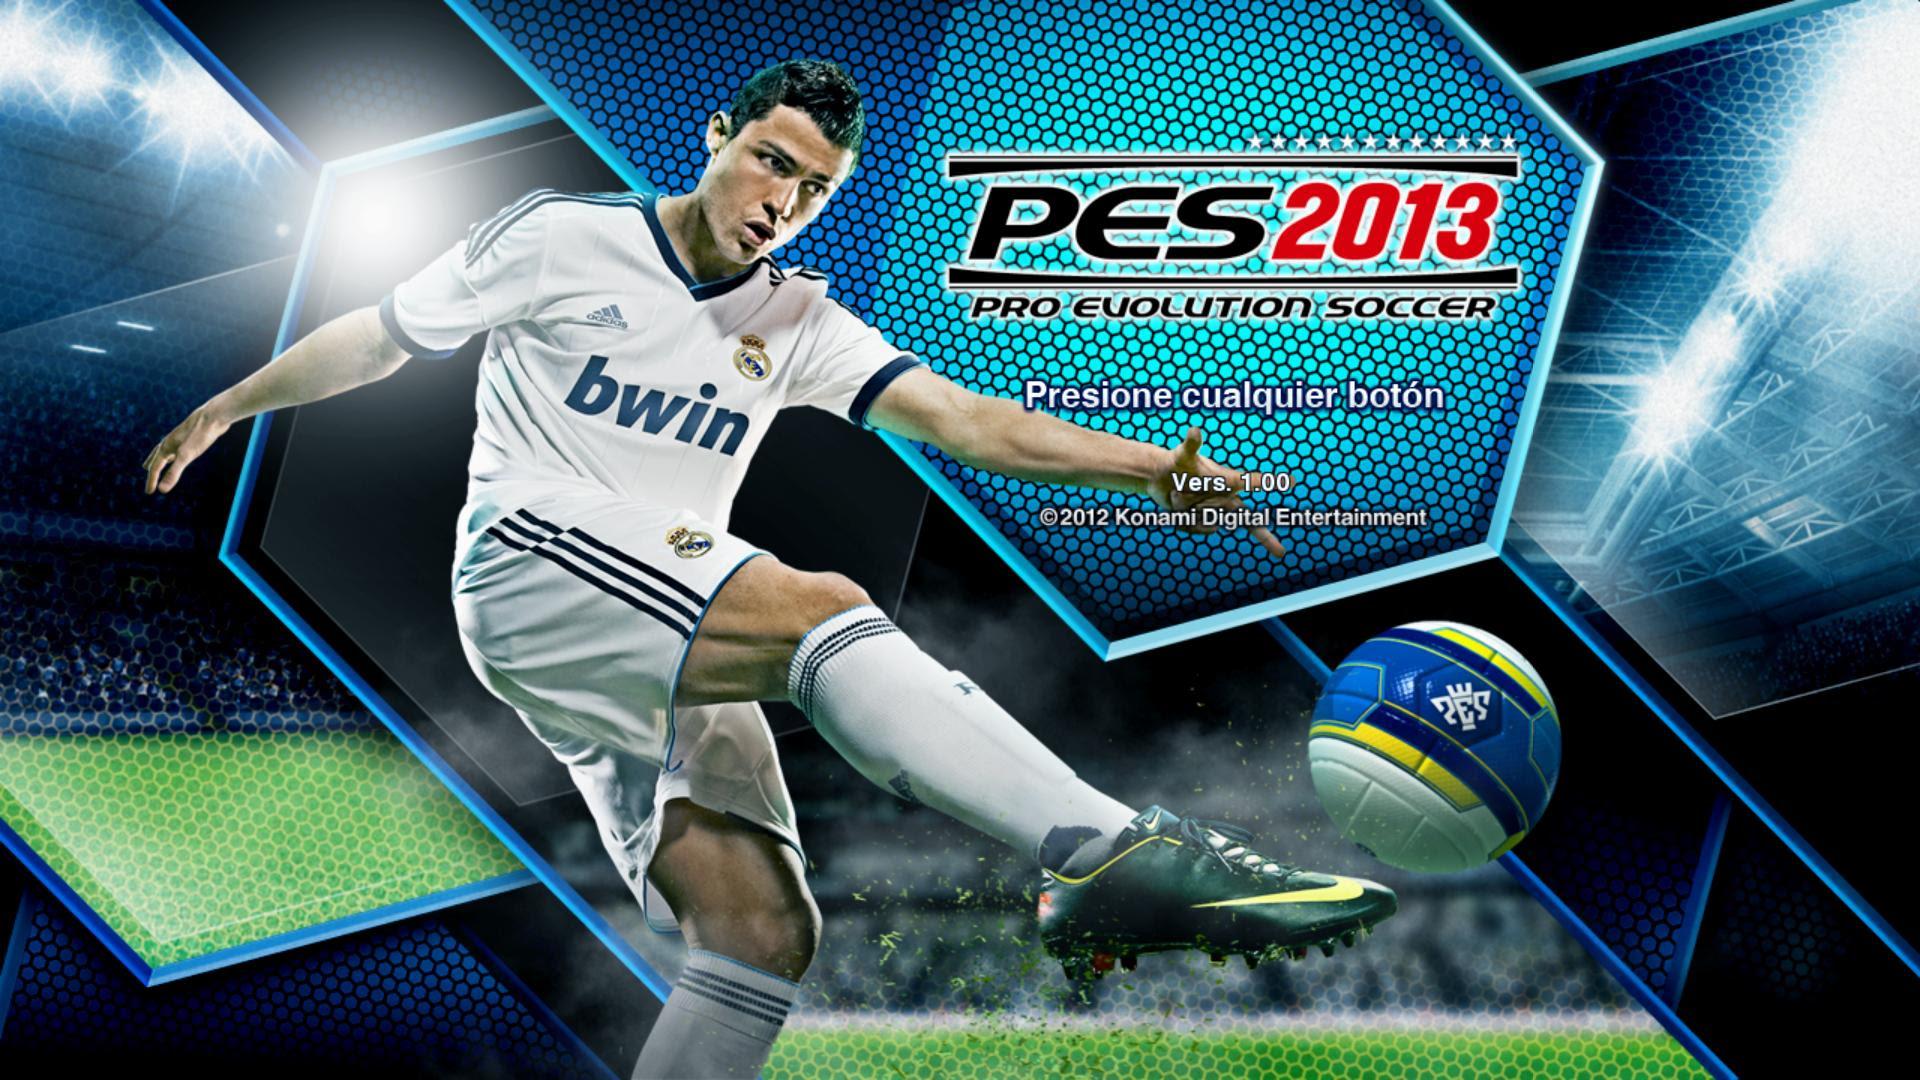 Download Update Pemain Pro Evolution Soccer (PES) 2013 Musim 2015/2016